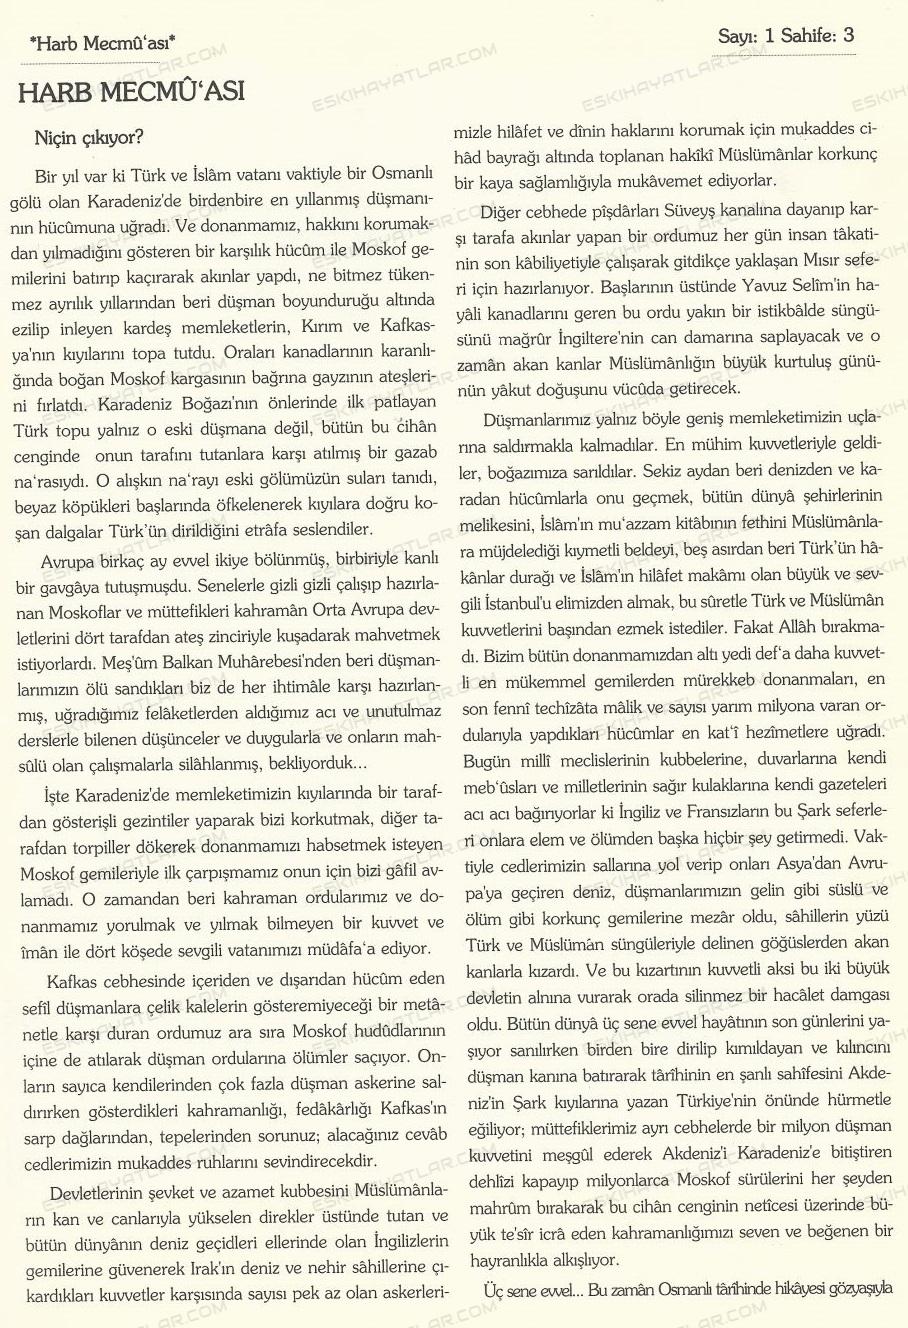 0490-harb-mecmuasi-kasim-1915-haziran-1918-turk-tarih-vakfi (6) (1)